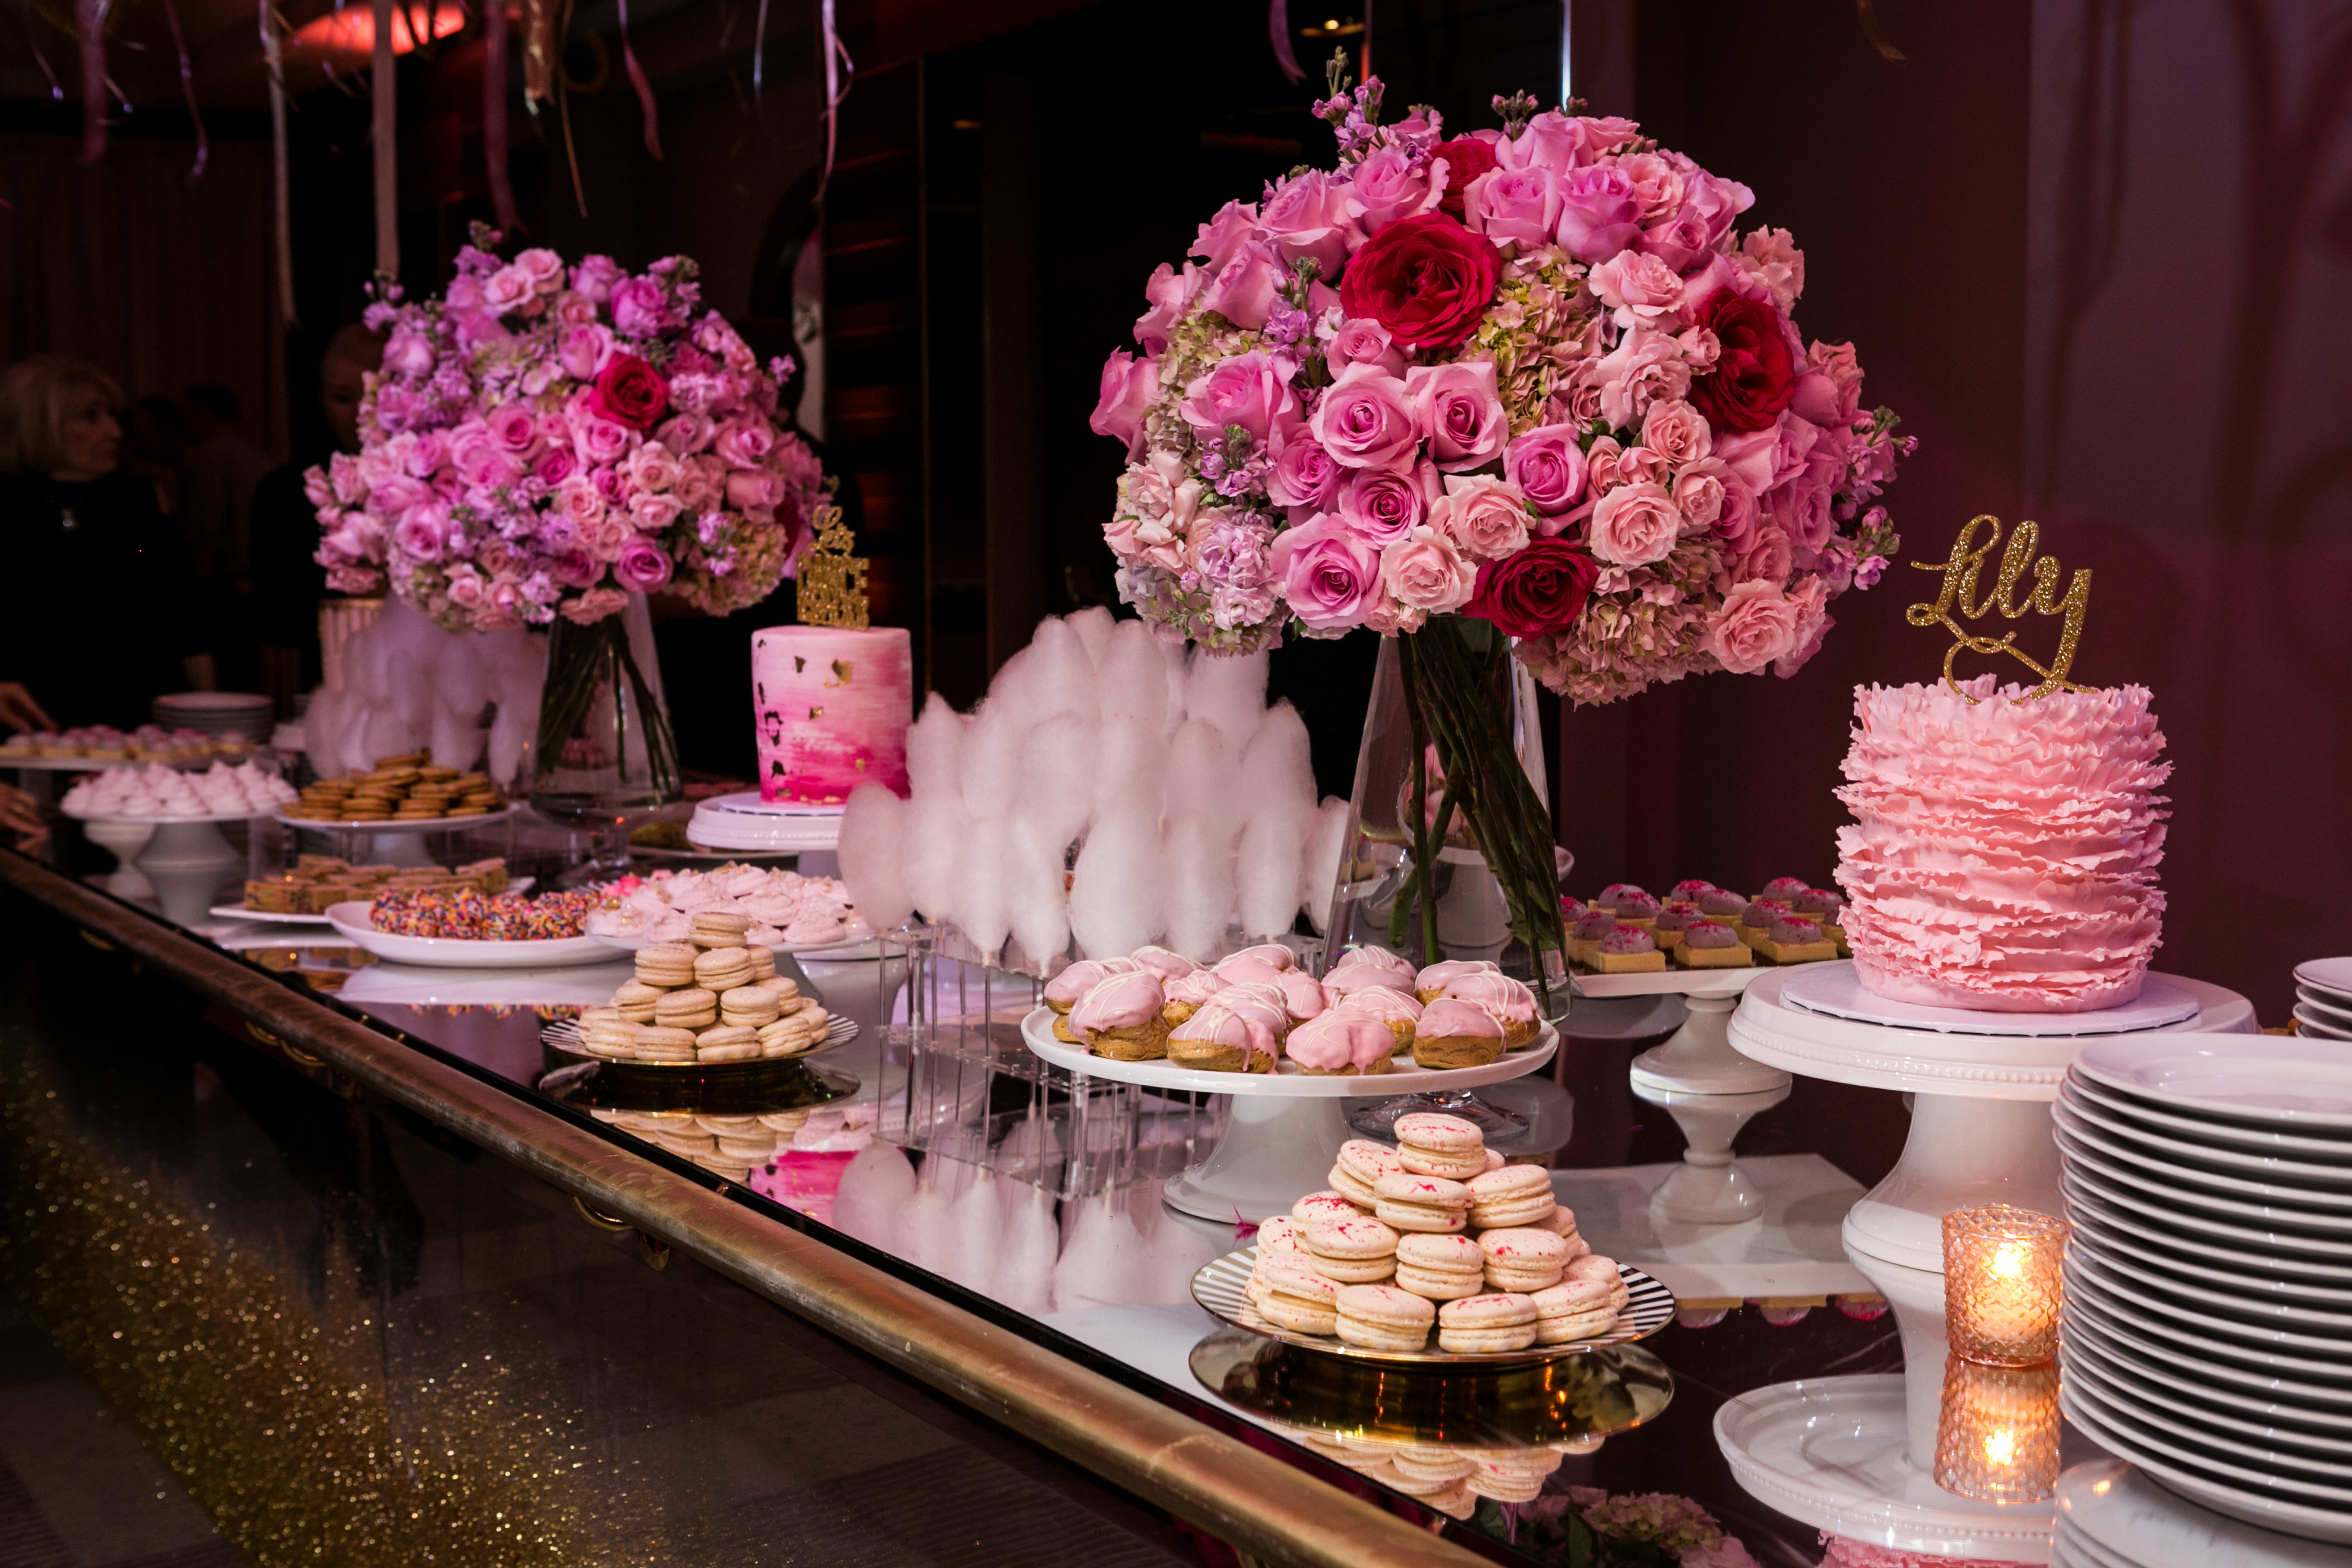 Ballet Pink Bat Mitzvah - Magnolia Bluebird design & events